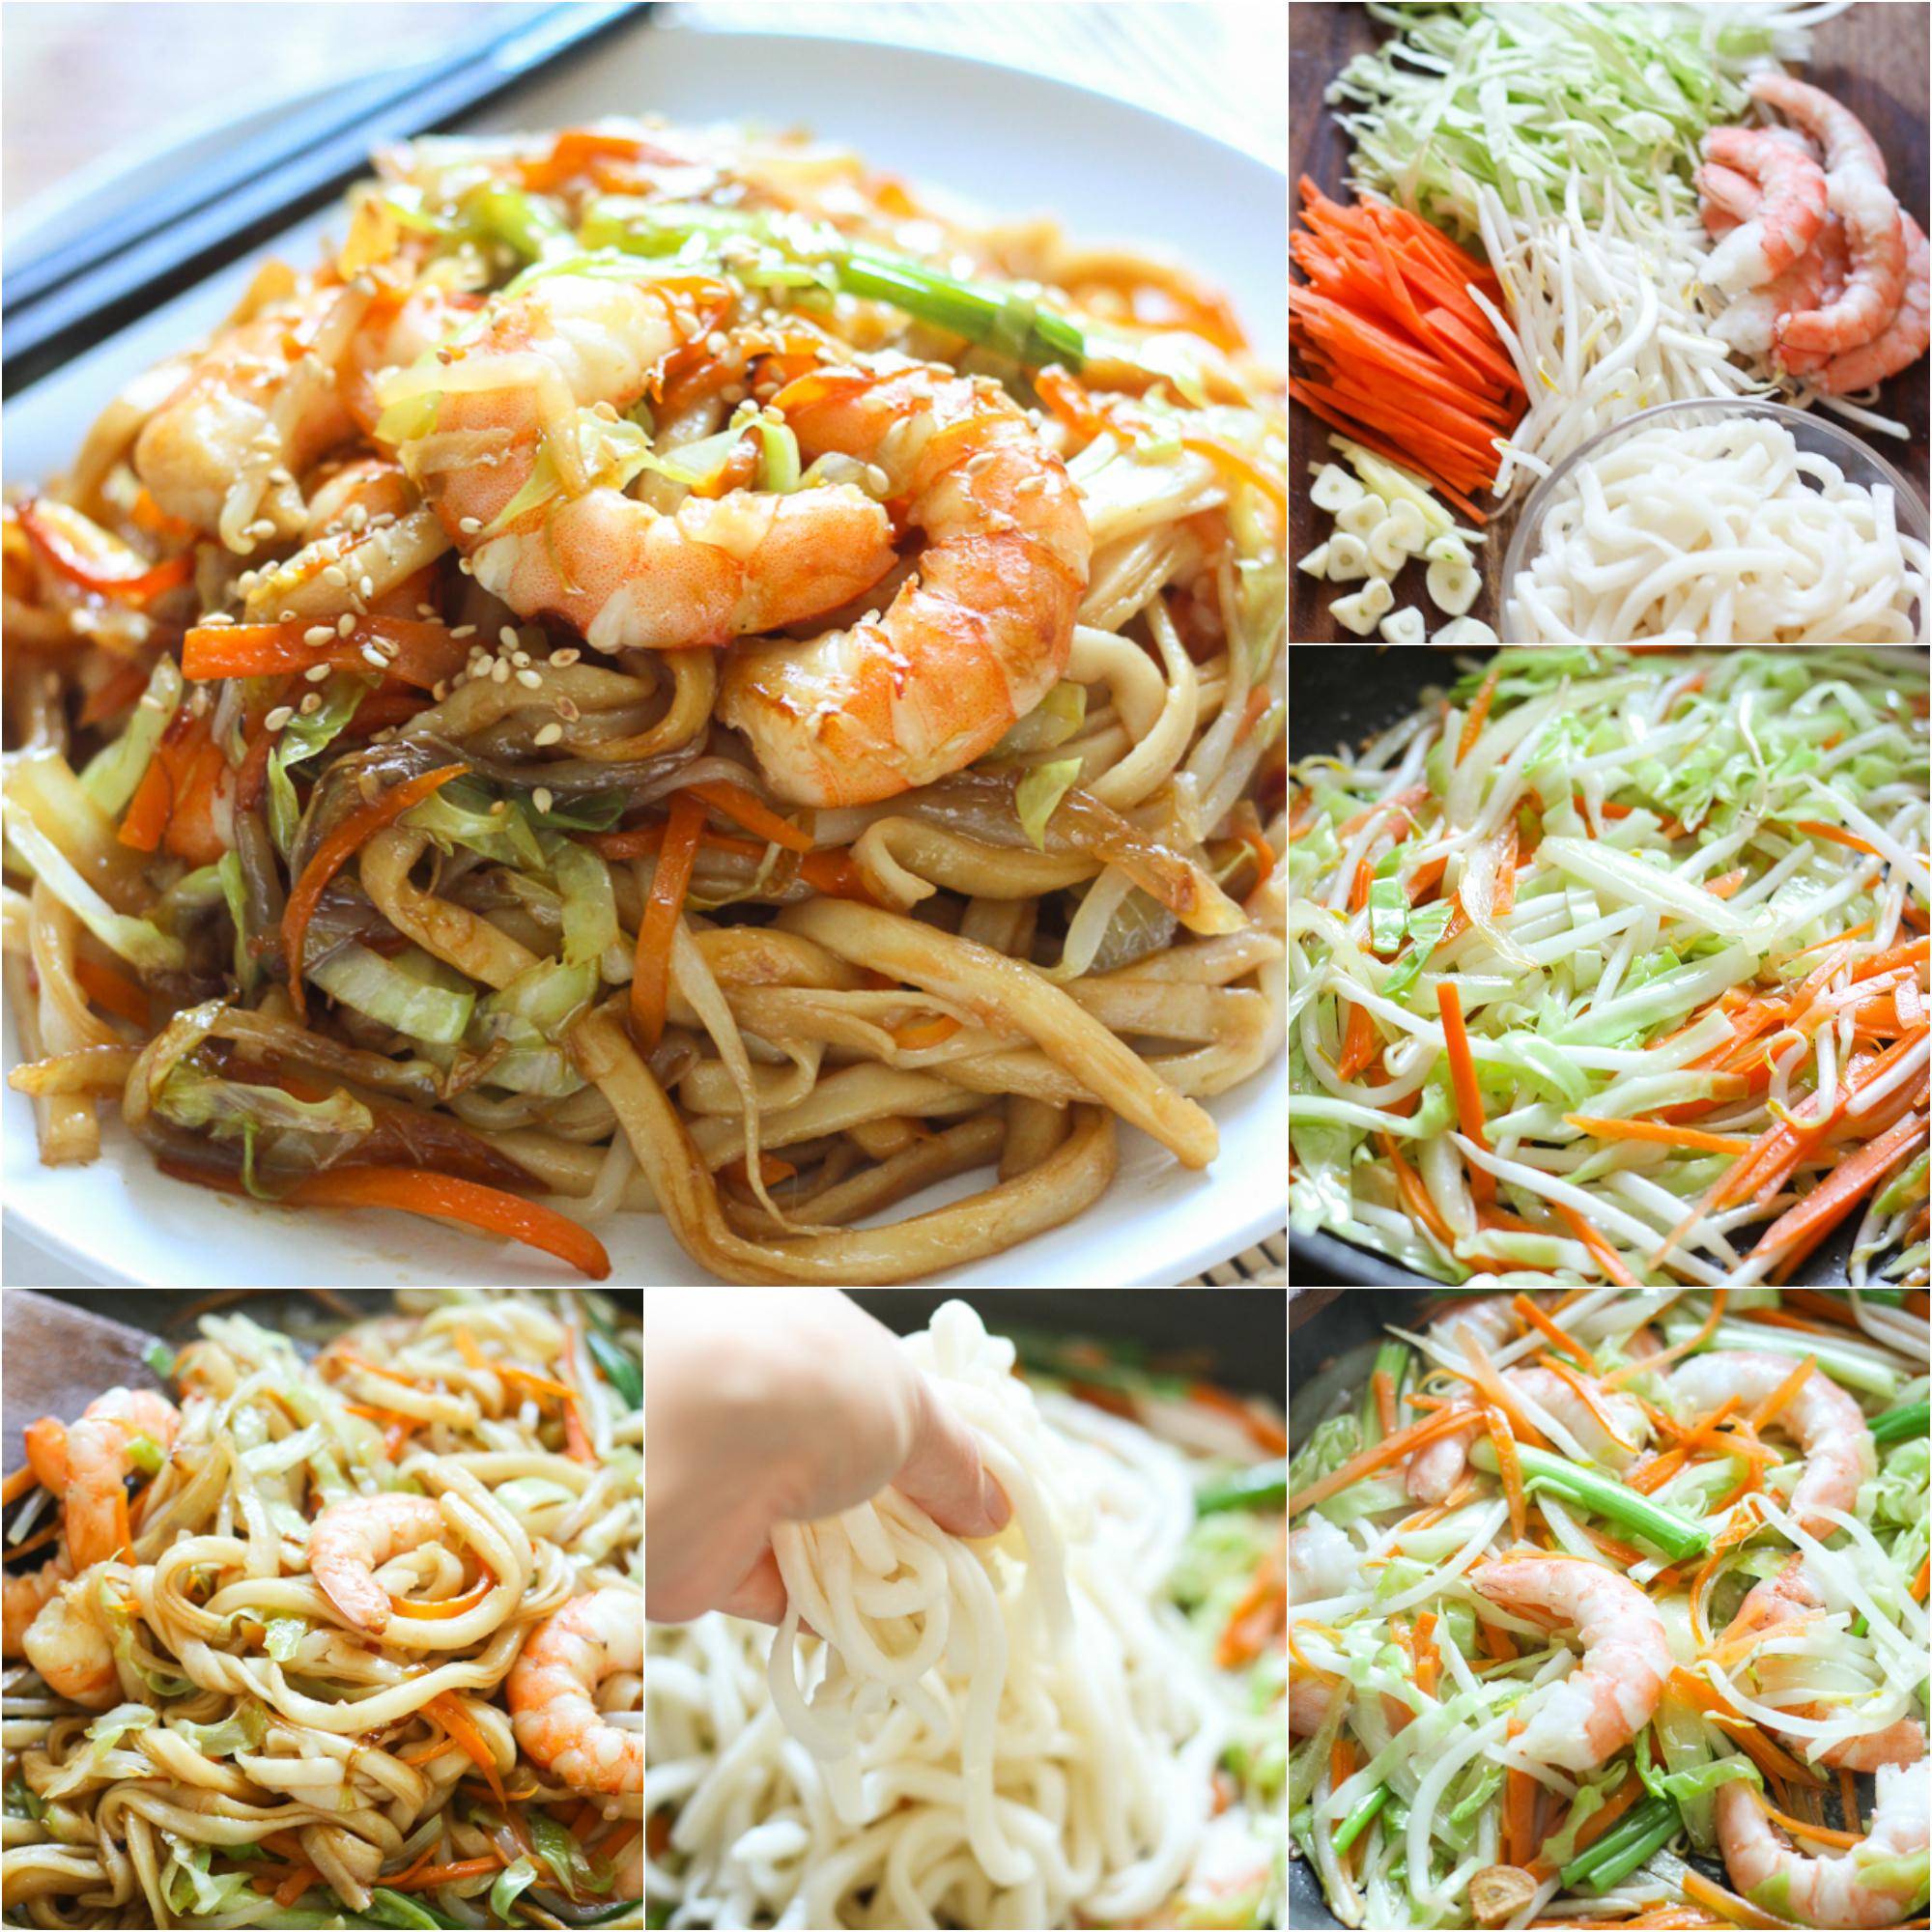 how-to-make-stir-fried-udon-with-shrimp